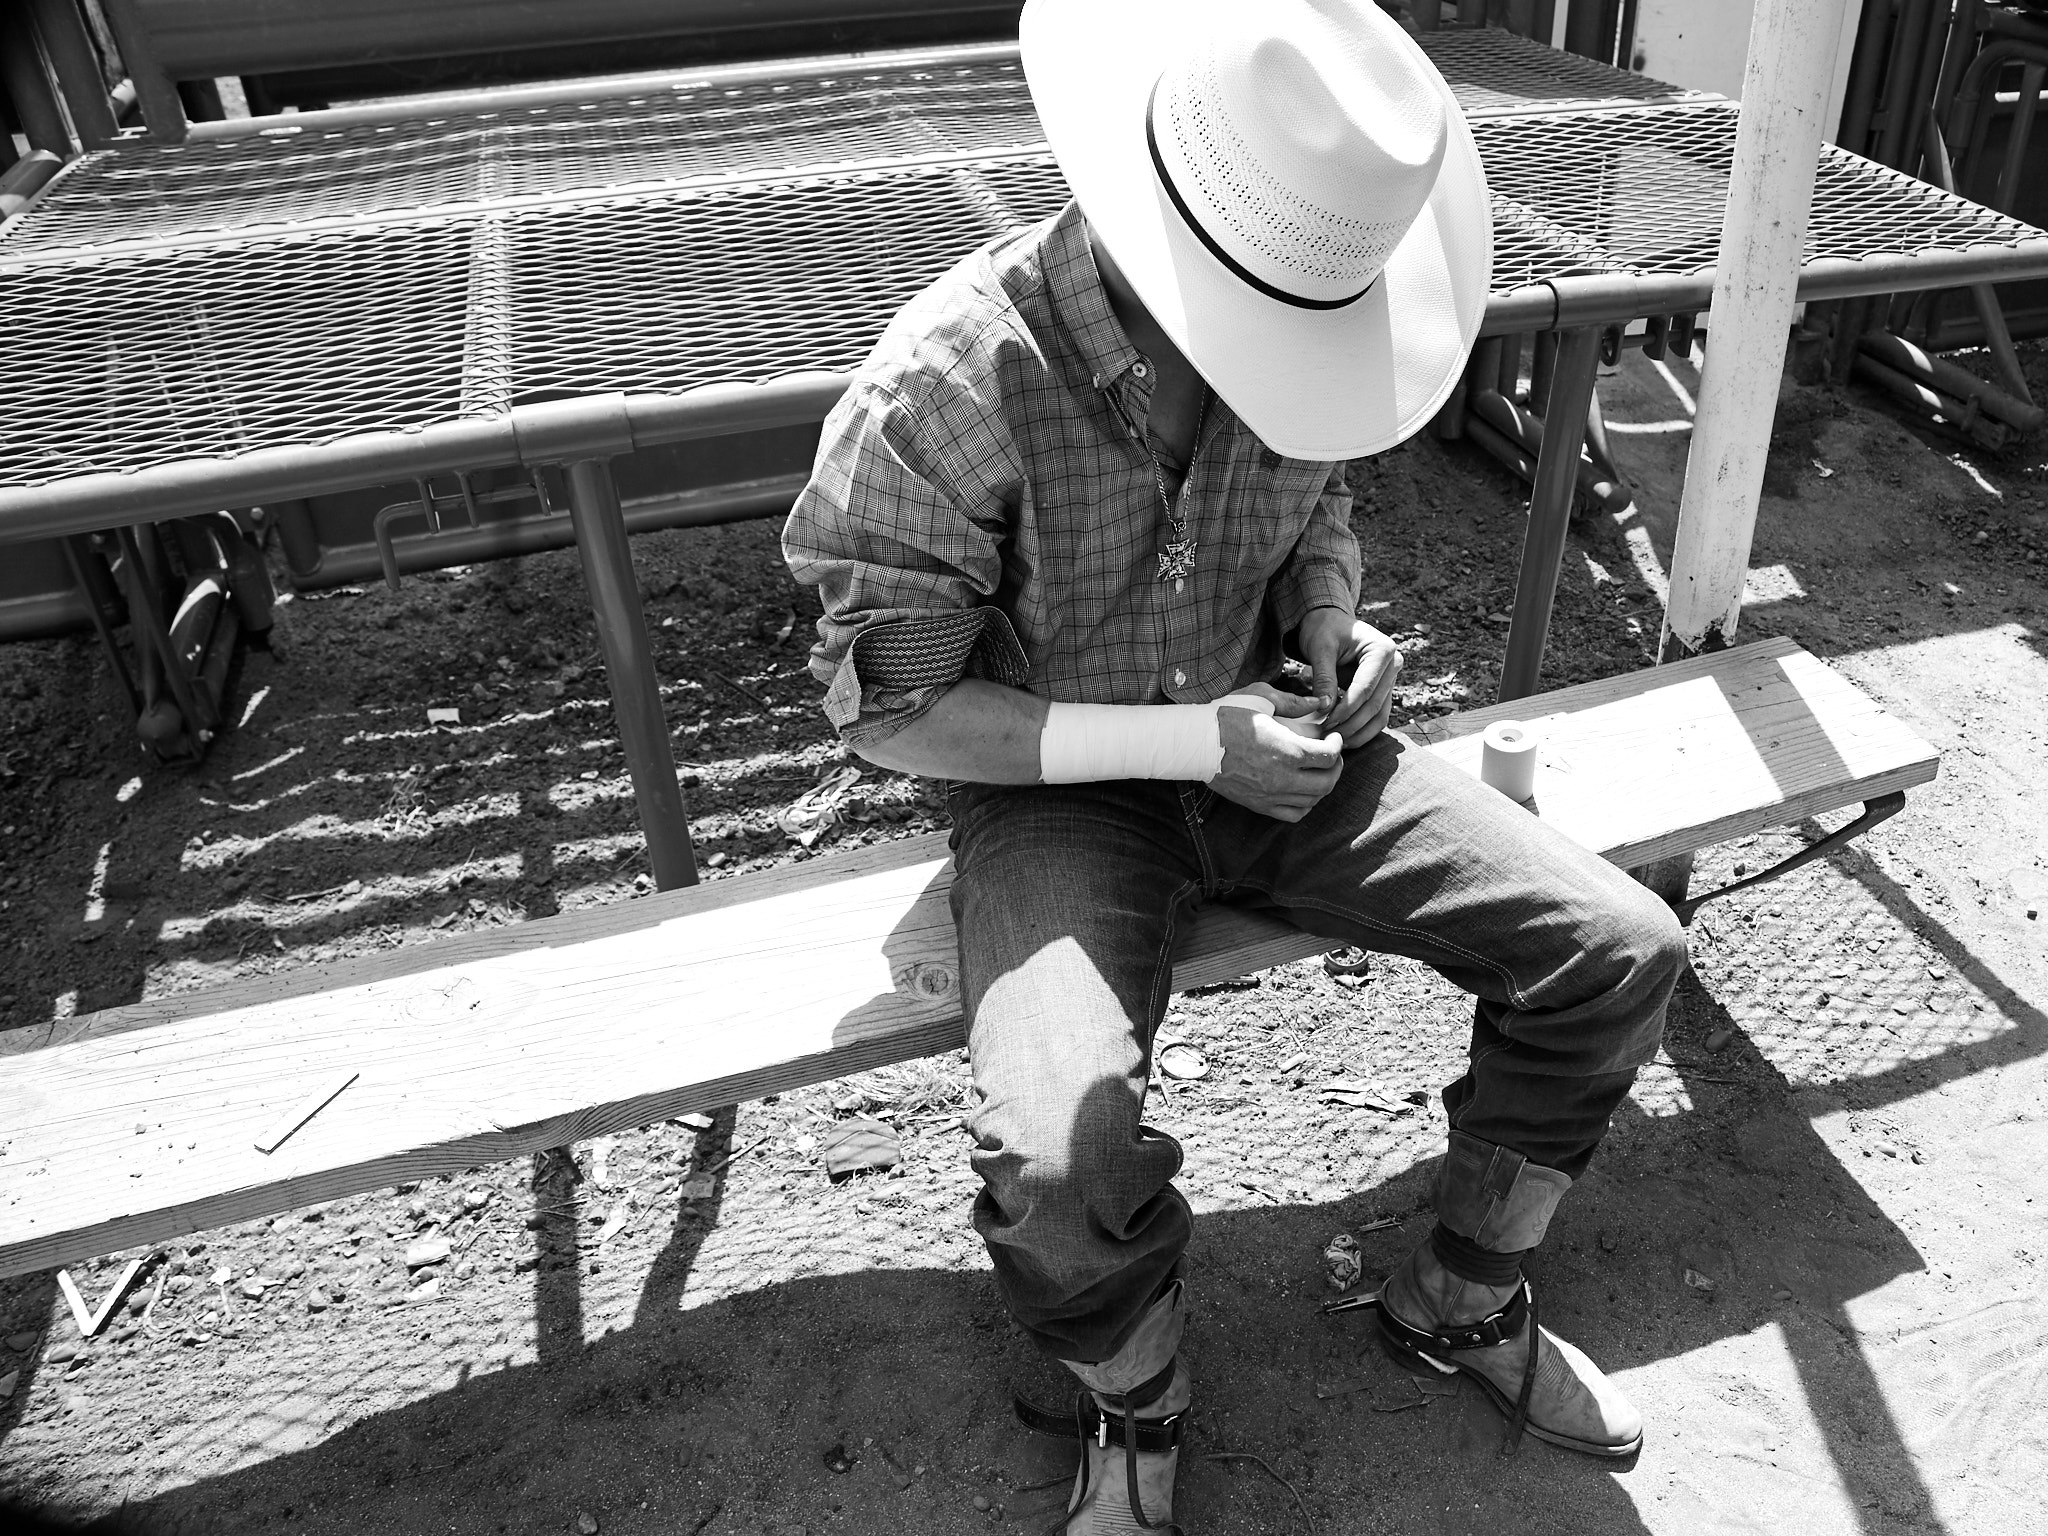 Rodeo_2019_026.jpg